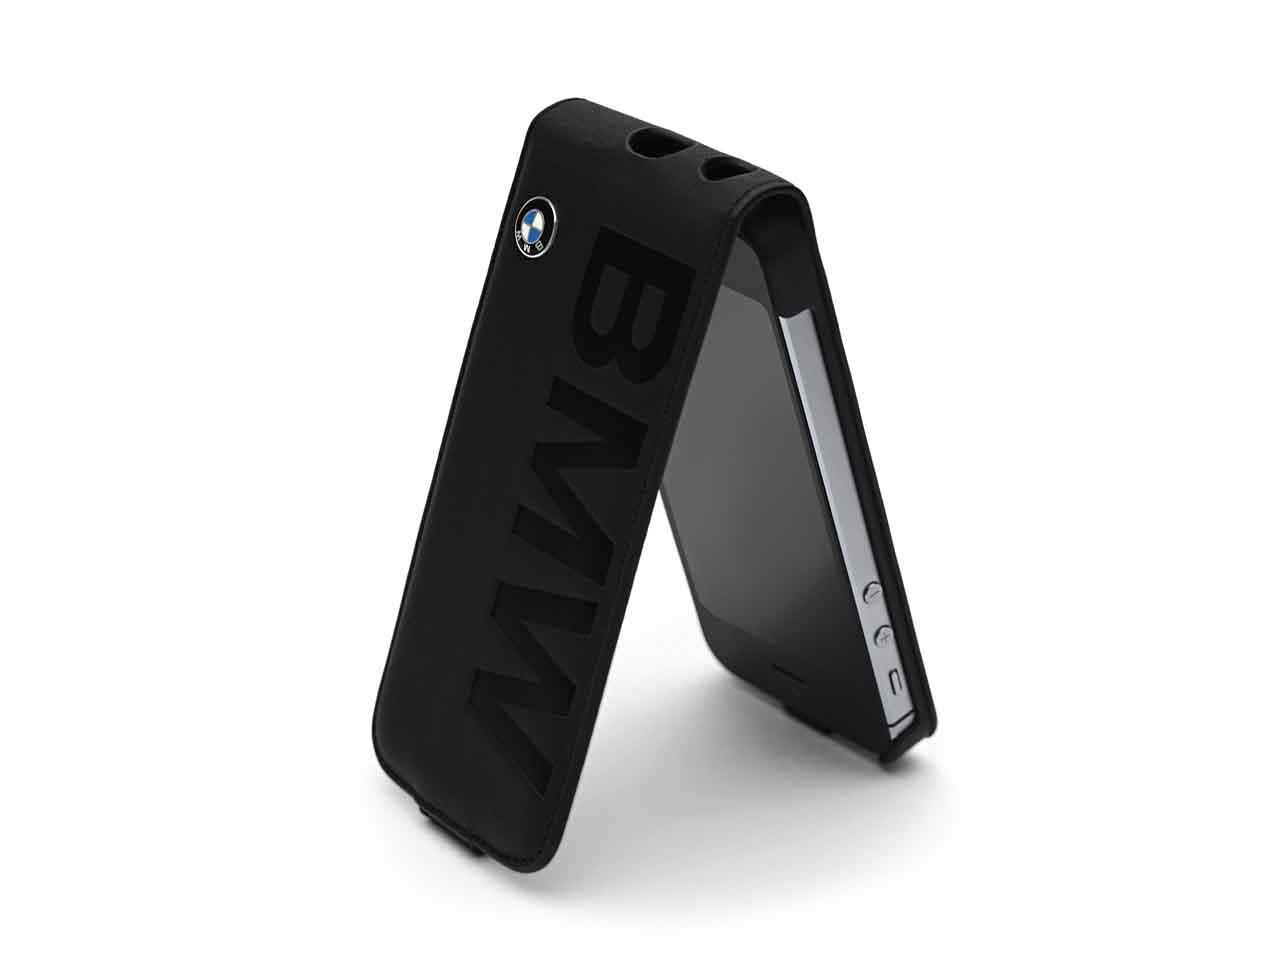 BMW Handy-Klapphülle Samsung Galaxy S4, schwarz